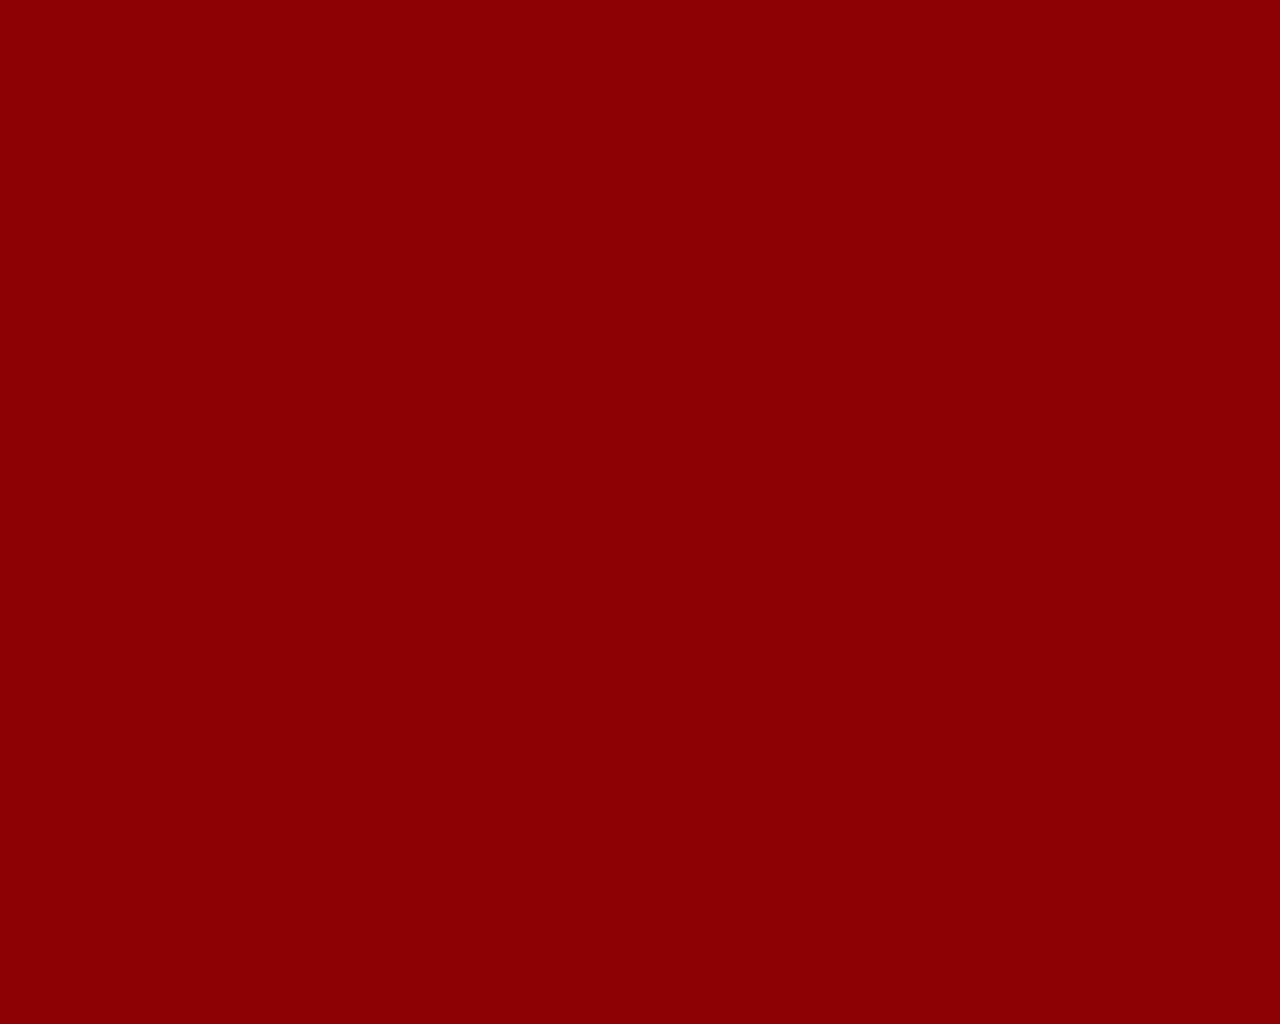 Red Color Background 1280x1024 Dark Red Solid Color #QLbgDP.